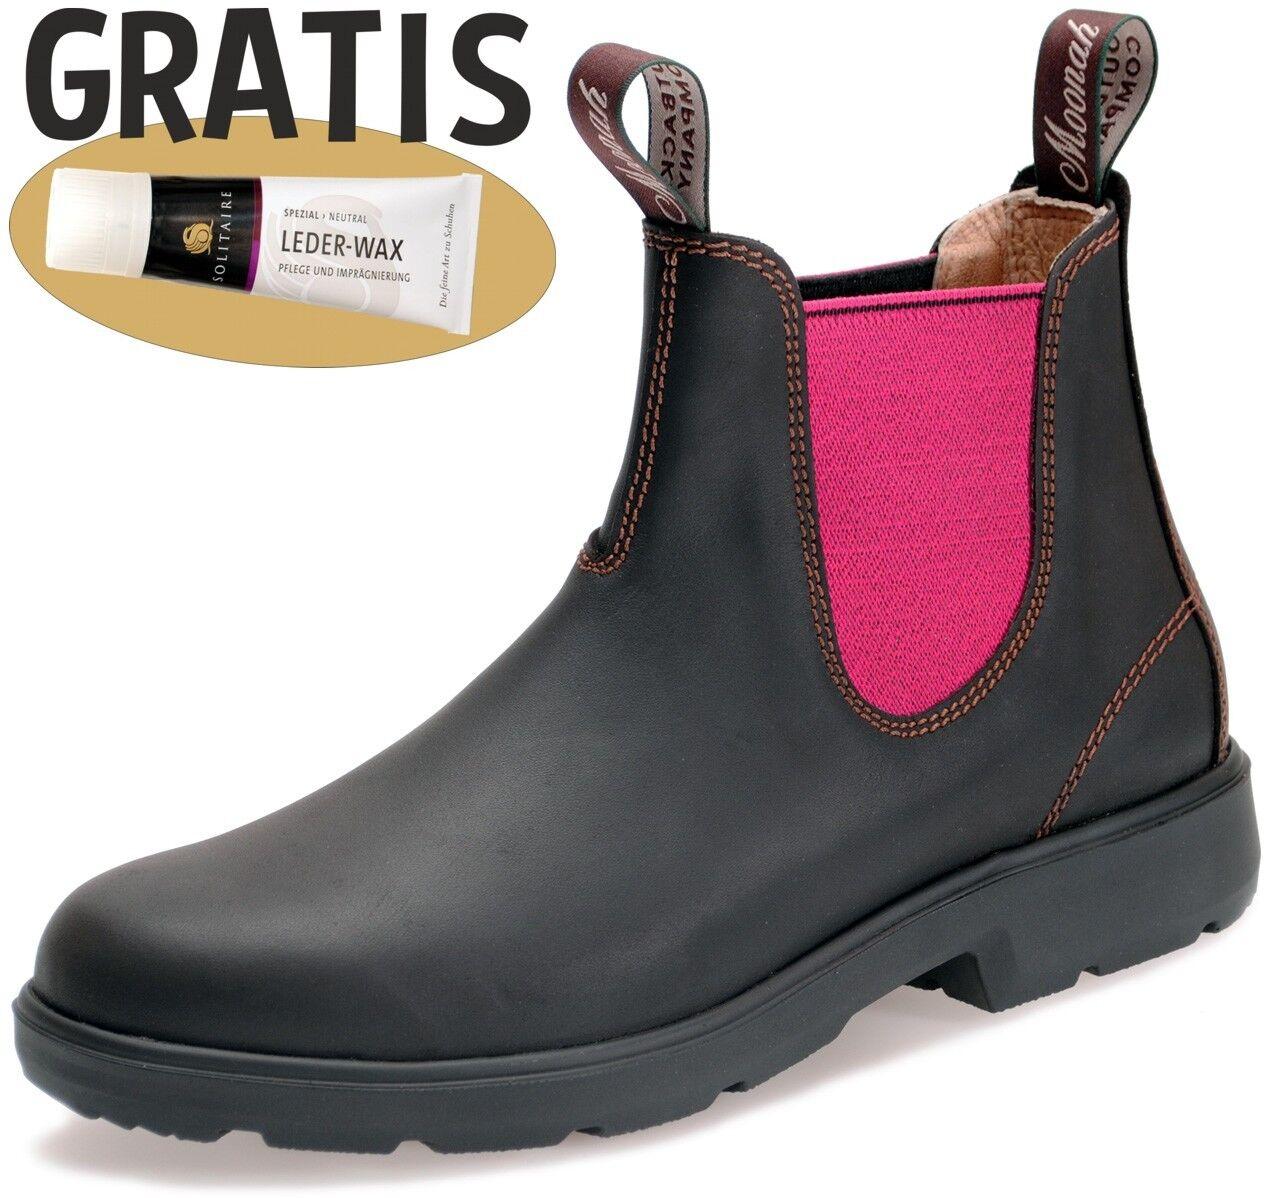 Moonah Boots Damen Teens Outdoor Leder - Dark Brown mit Gummizug PINK + Lederwax